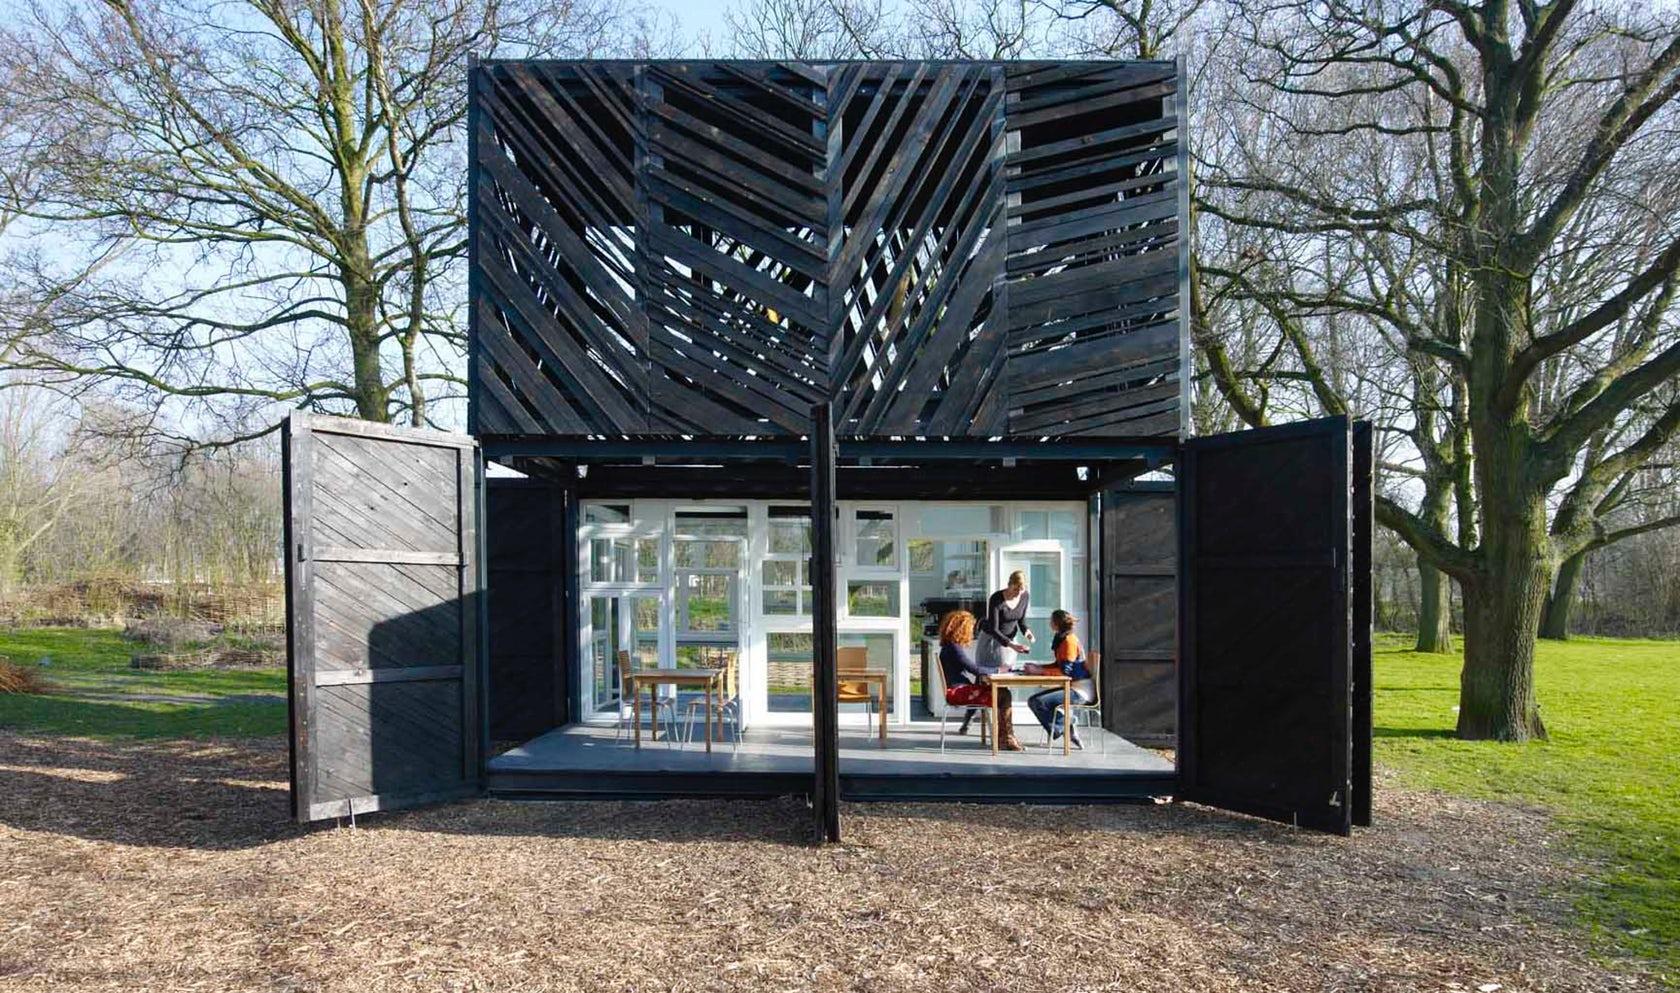 Noorderparkbar คาเฟ่รีไซเคิลในเนเธอร์แลนด์ที่สร้างจากวัสดุเหลือใช้ทั้งหมด